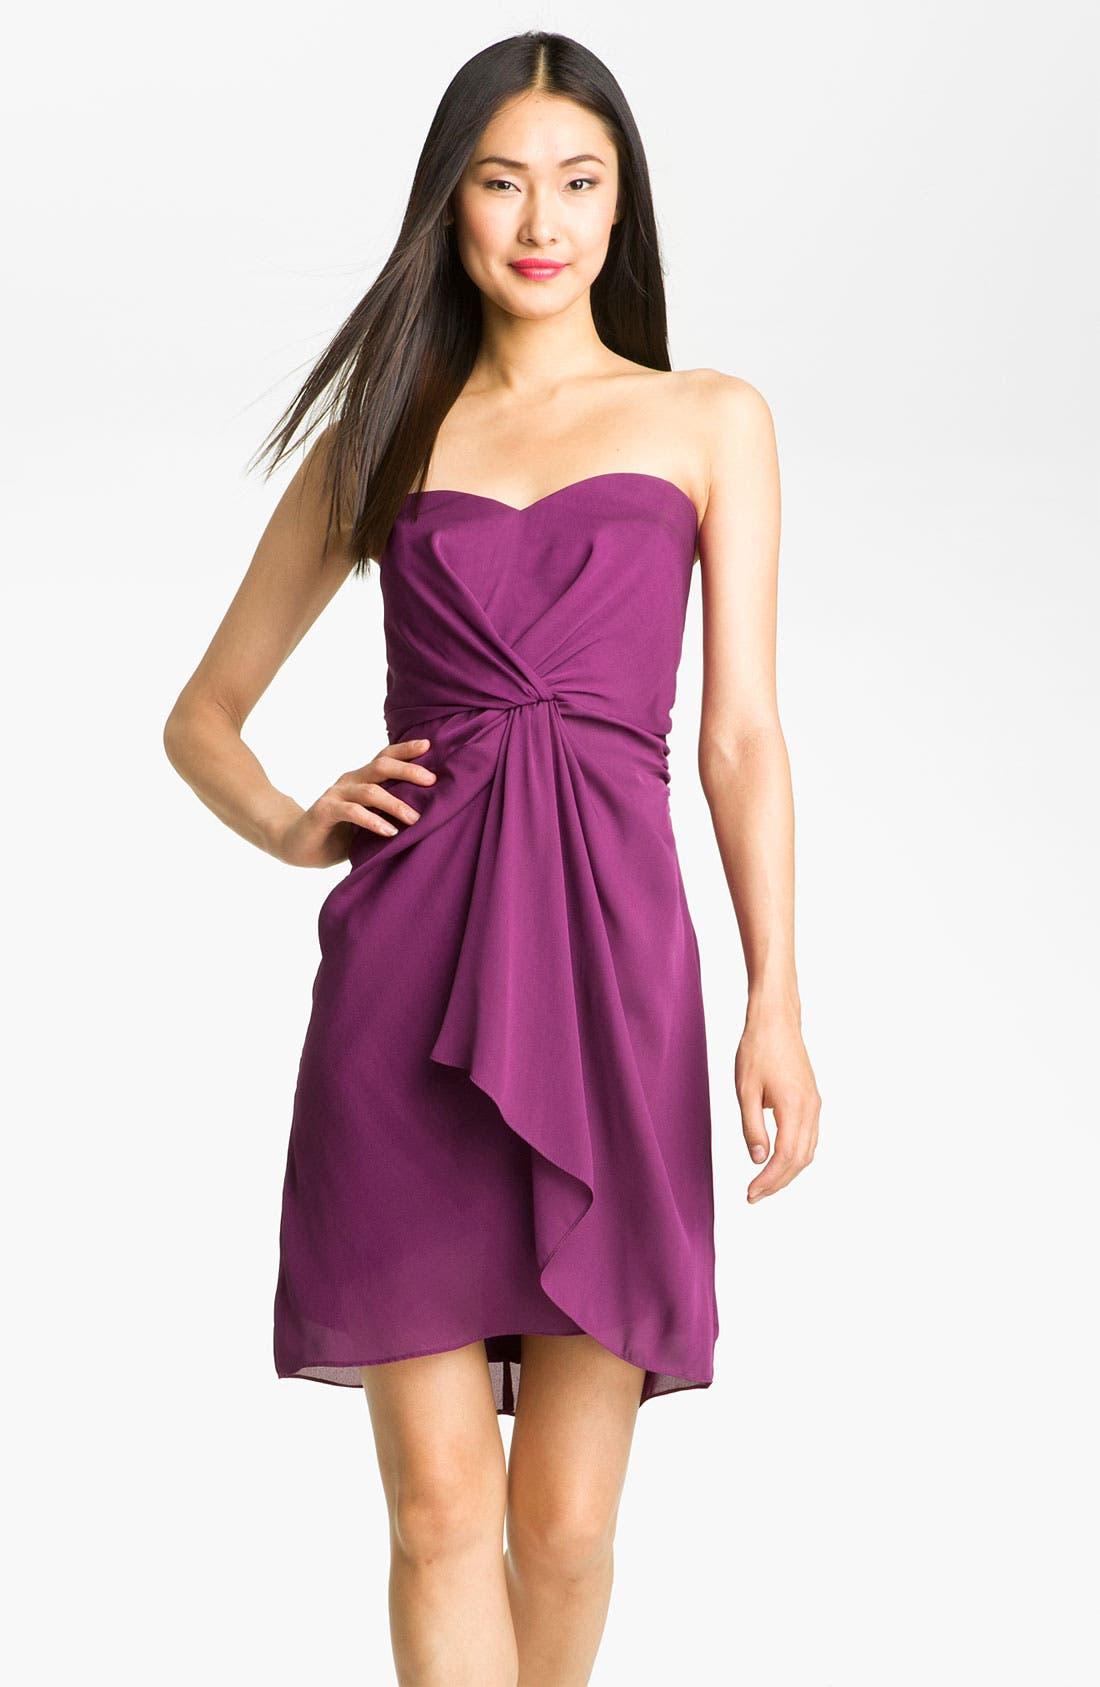 Alternate Image 1 Selected - Max & Cleo 'Jenna' Front Knot Strapless Chiffon Dress